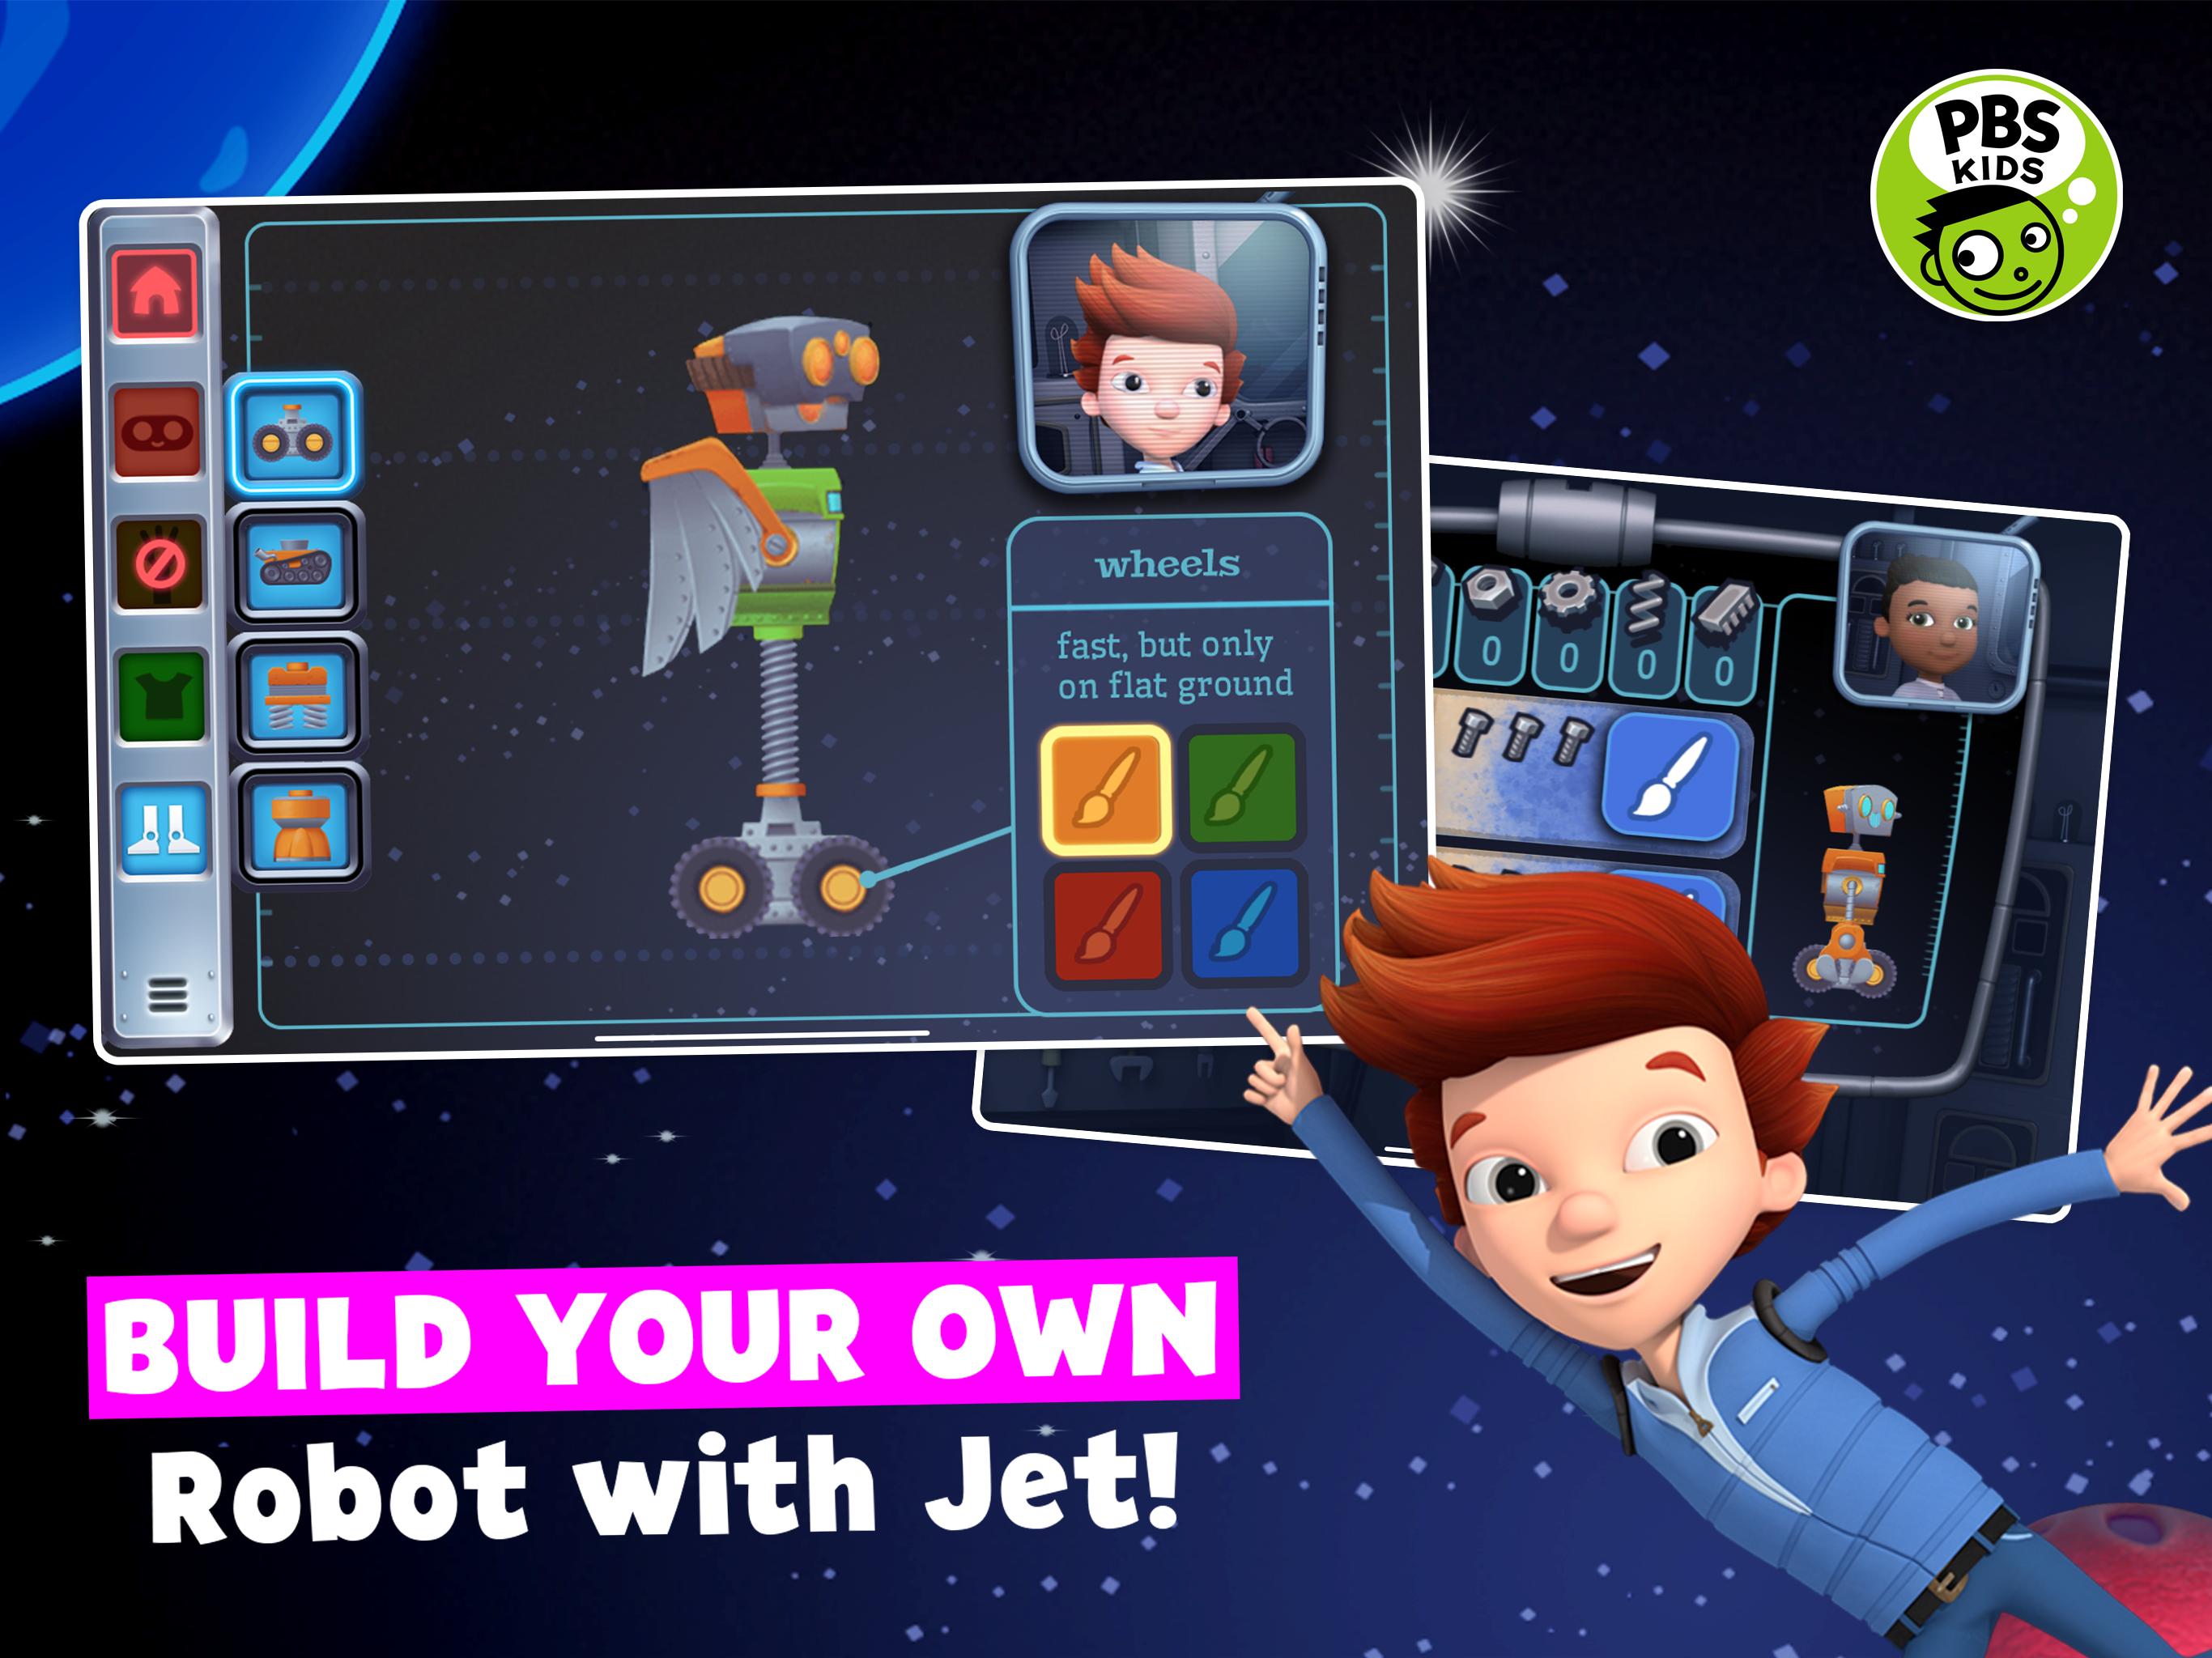 5bd1d455 Jet's Bot Builder Mobile Downloads | PBS KIDS